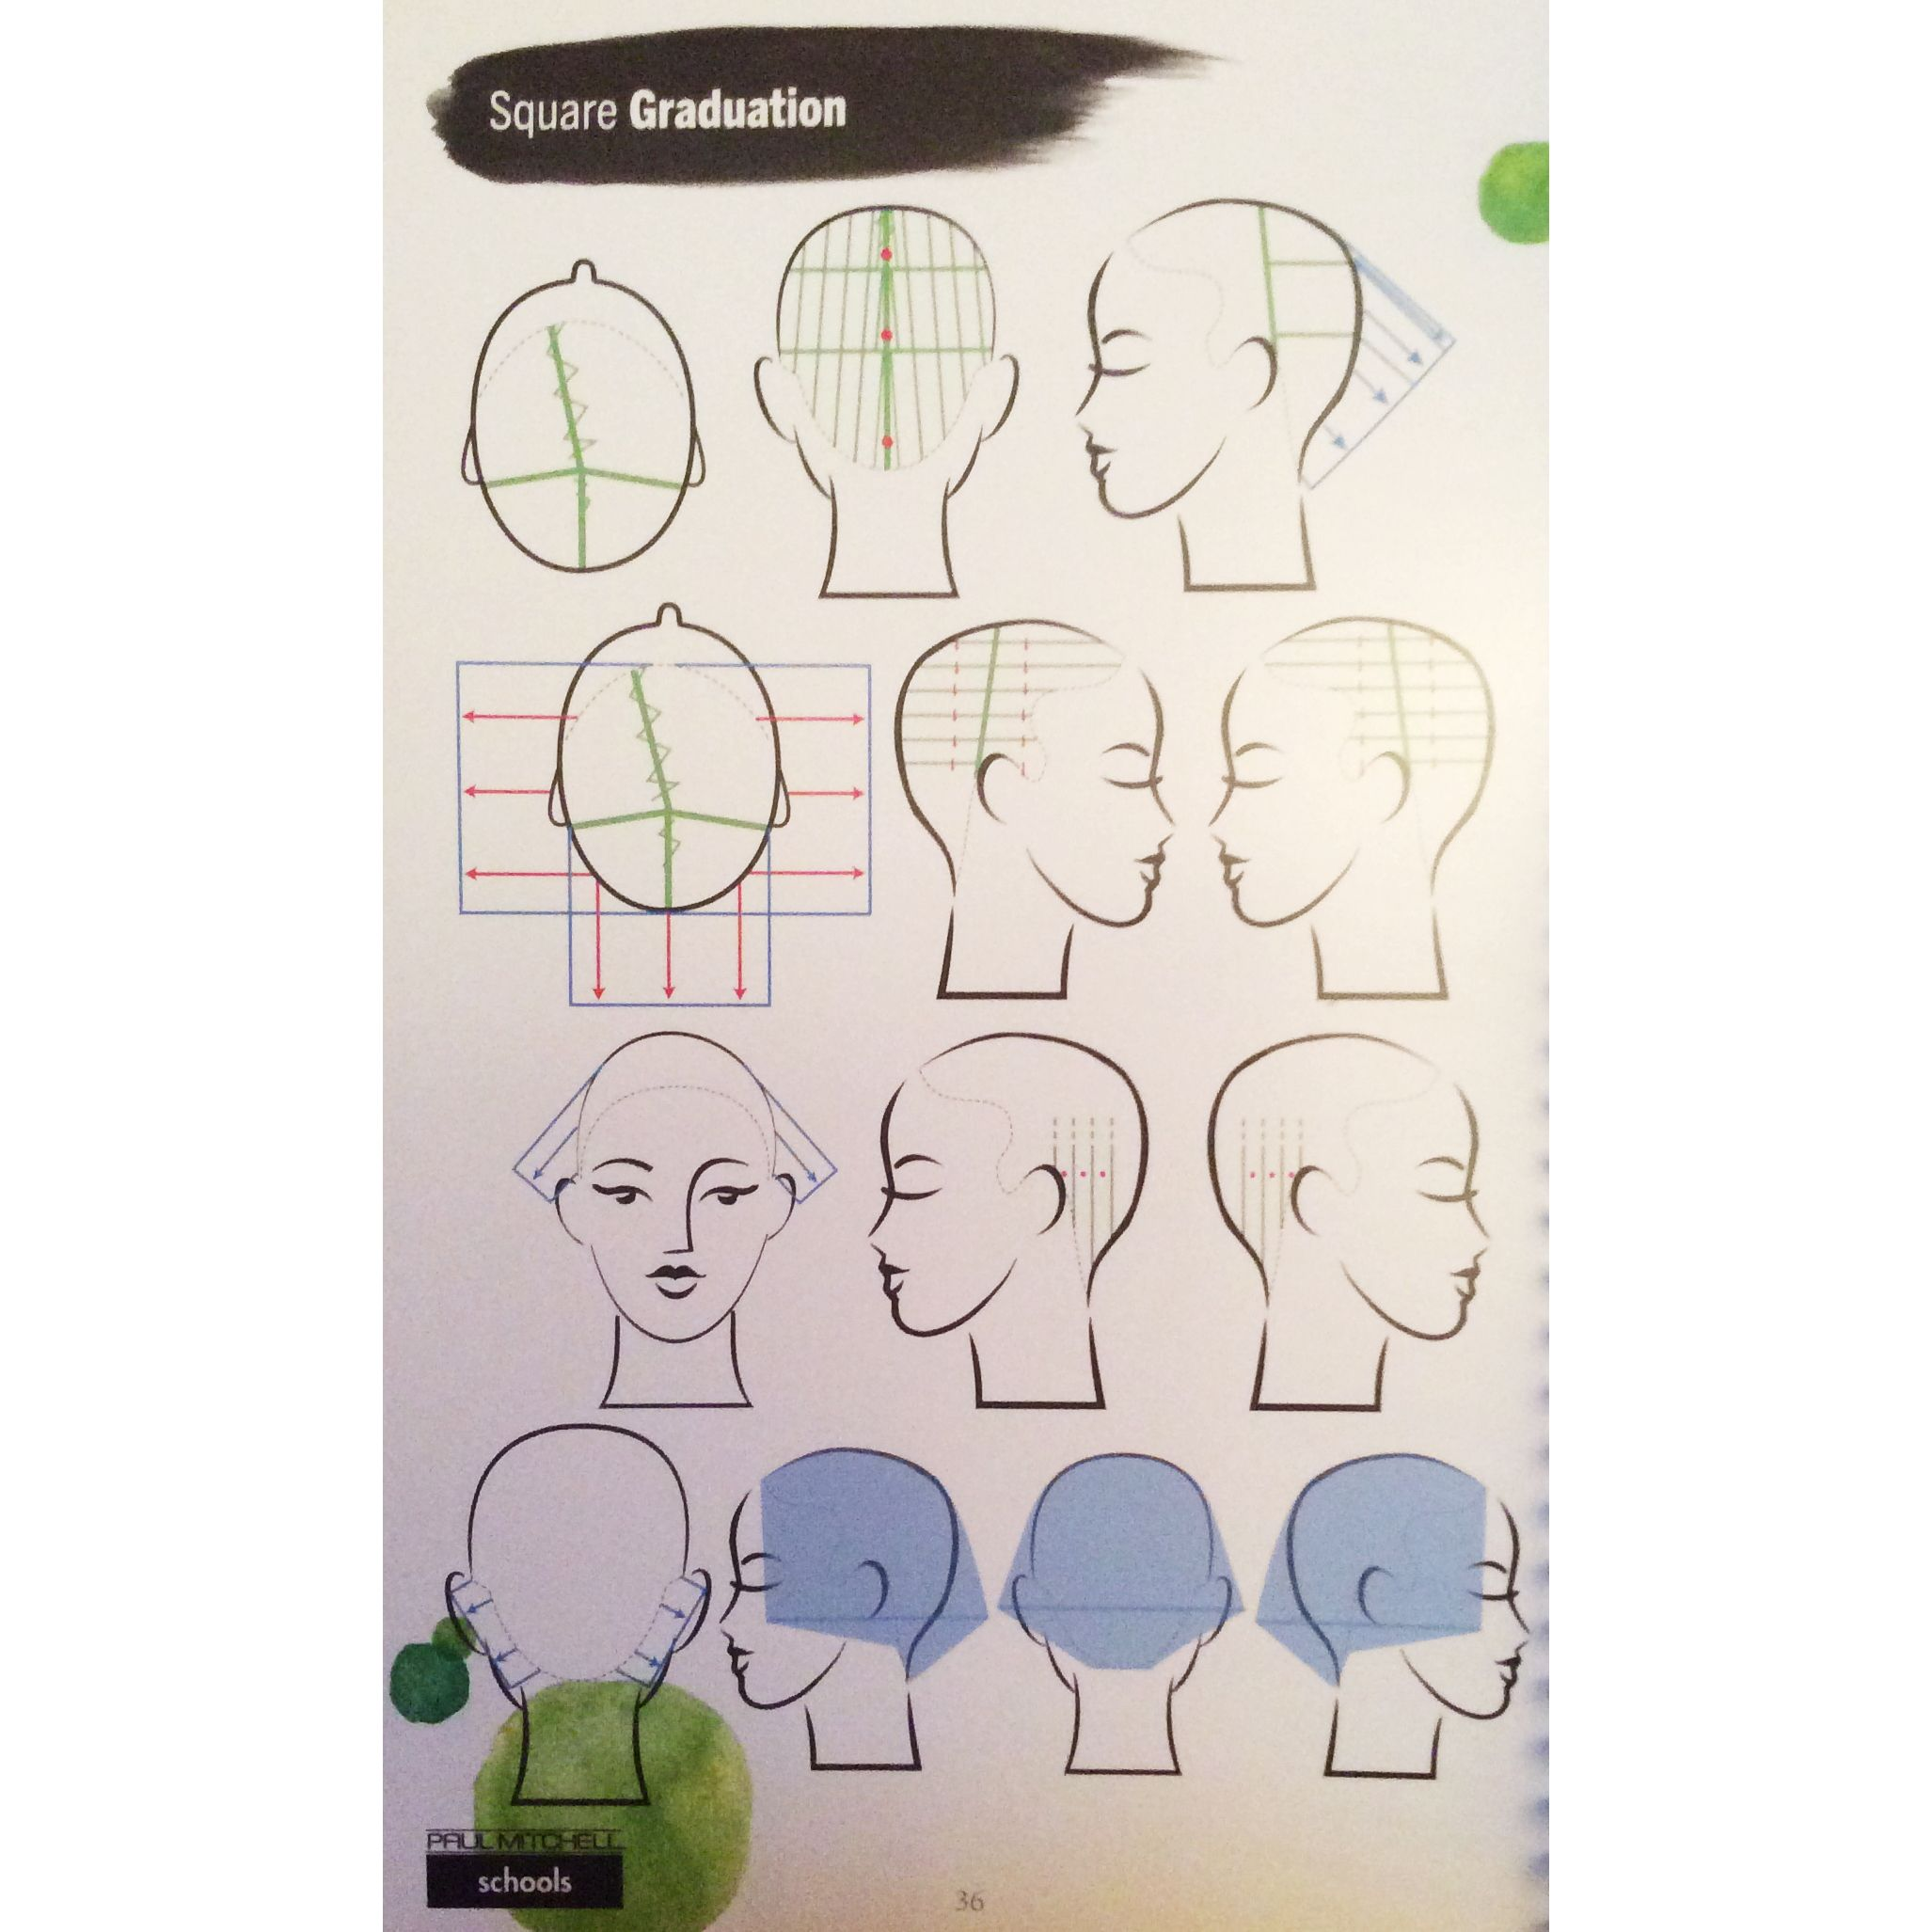 Square graduation diagram  Paul mitchell hair products, Hair